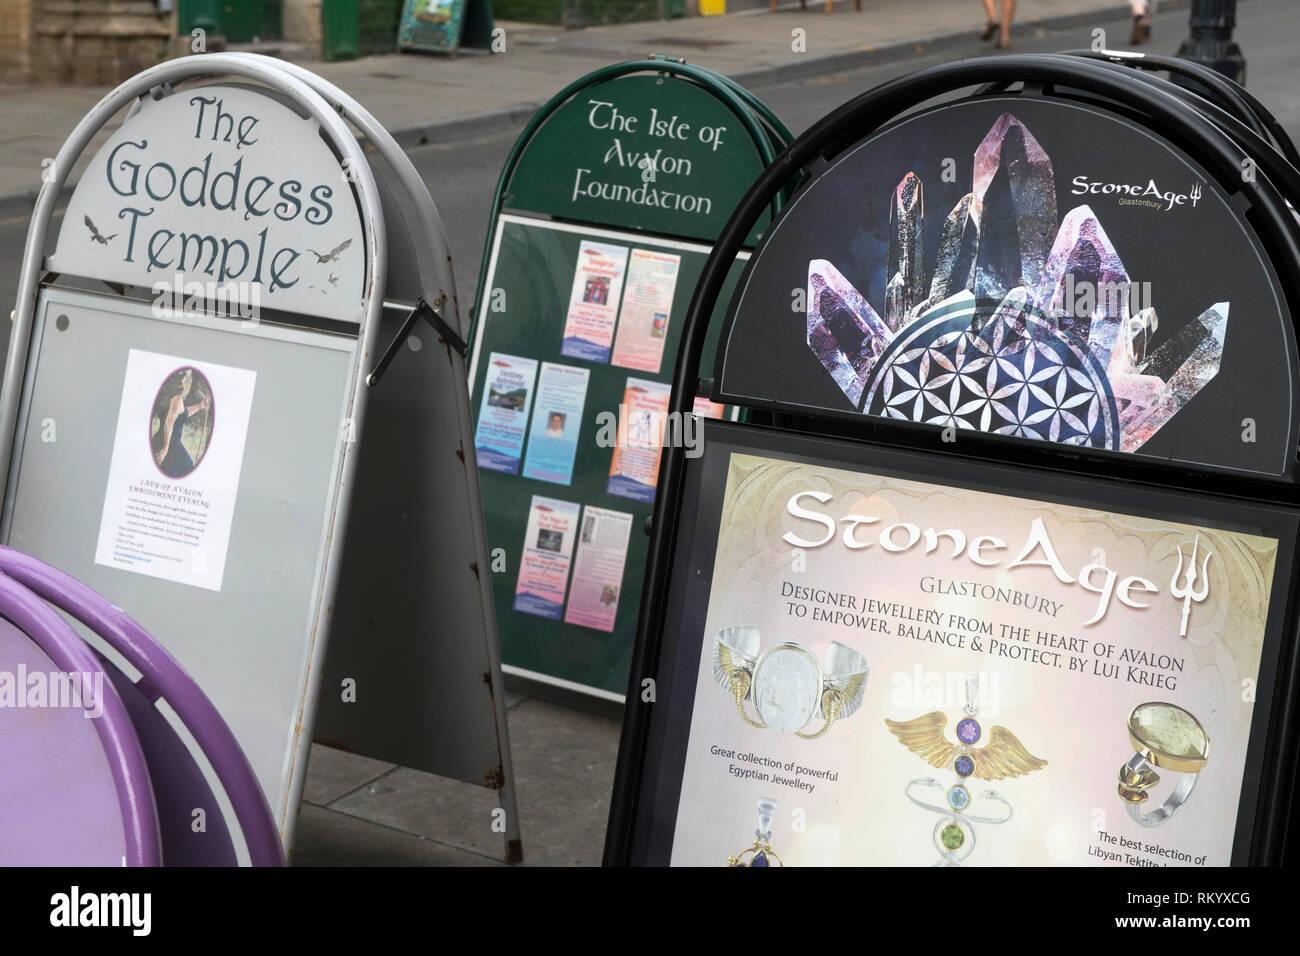 Treatments on offer at the Glastonbury Experience in Glastonbury, UK - Stock Image